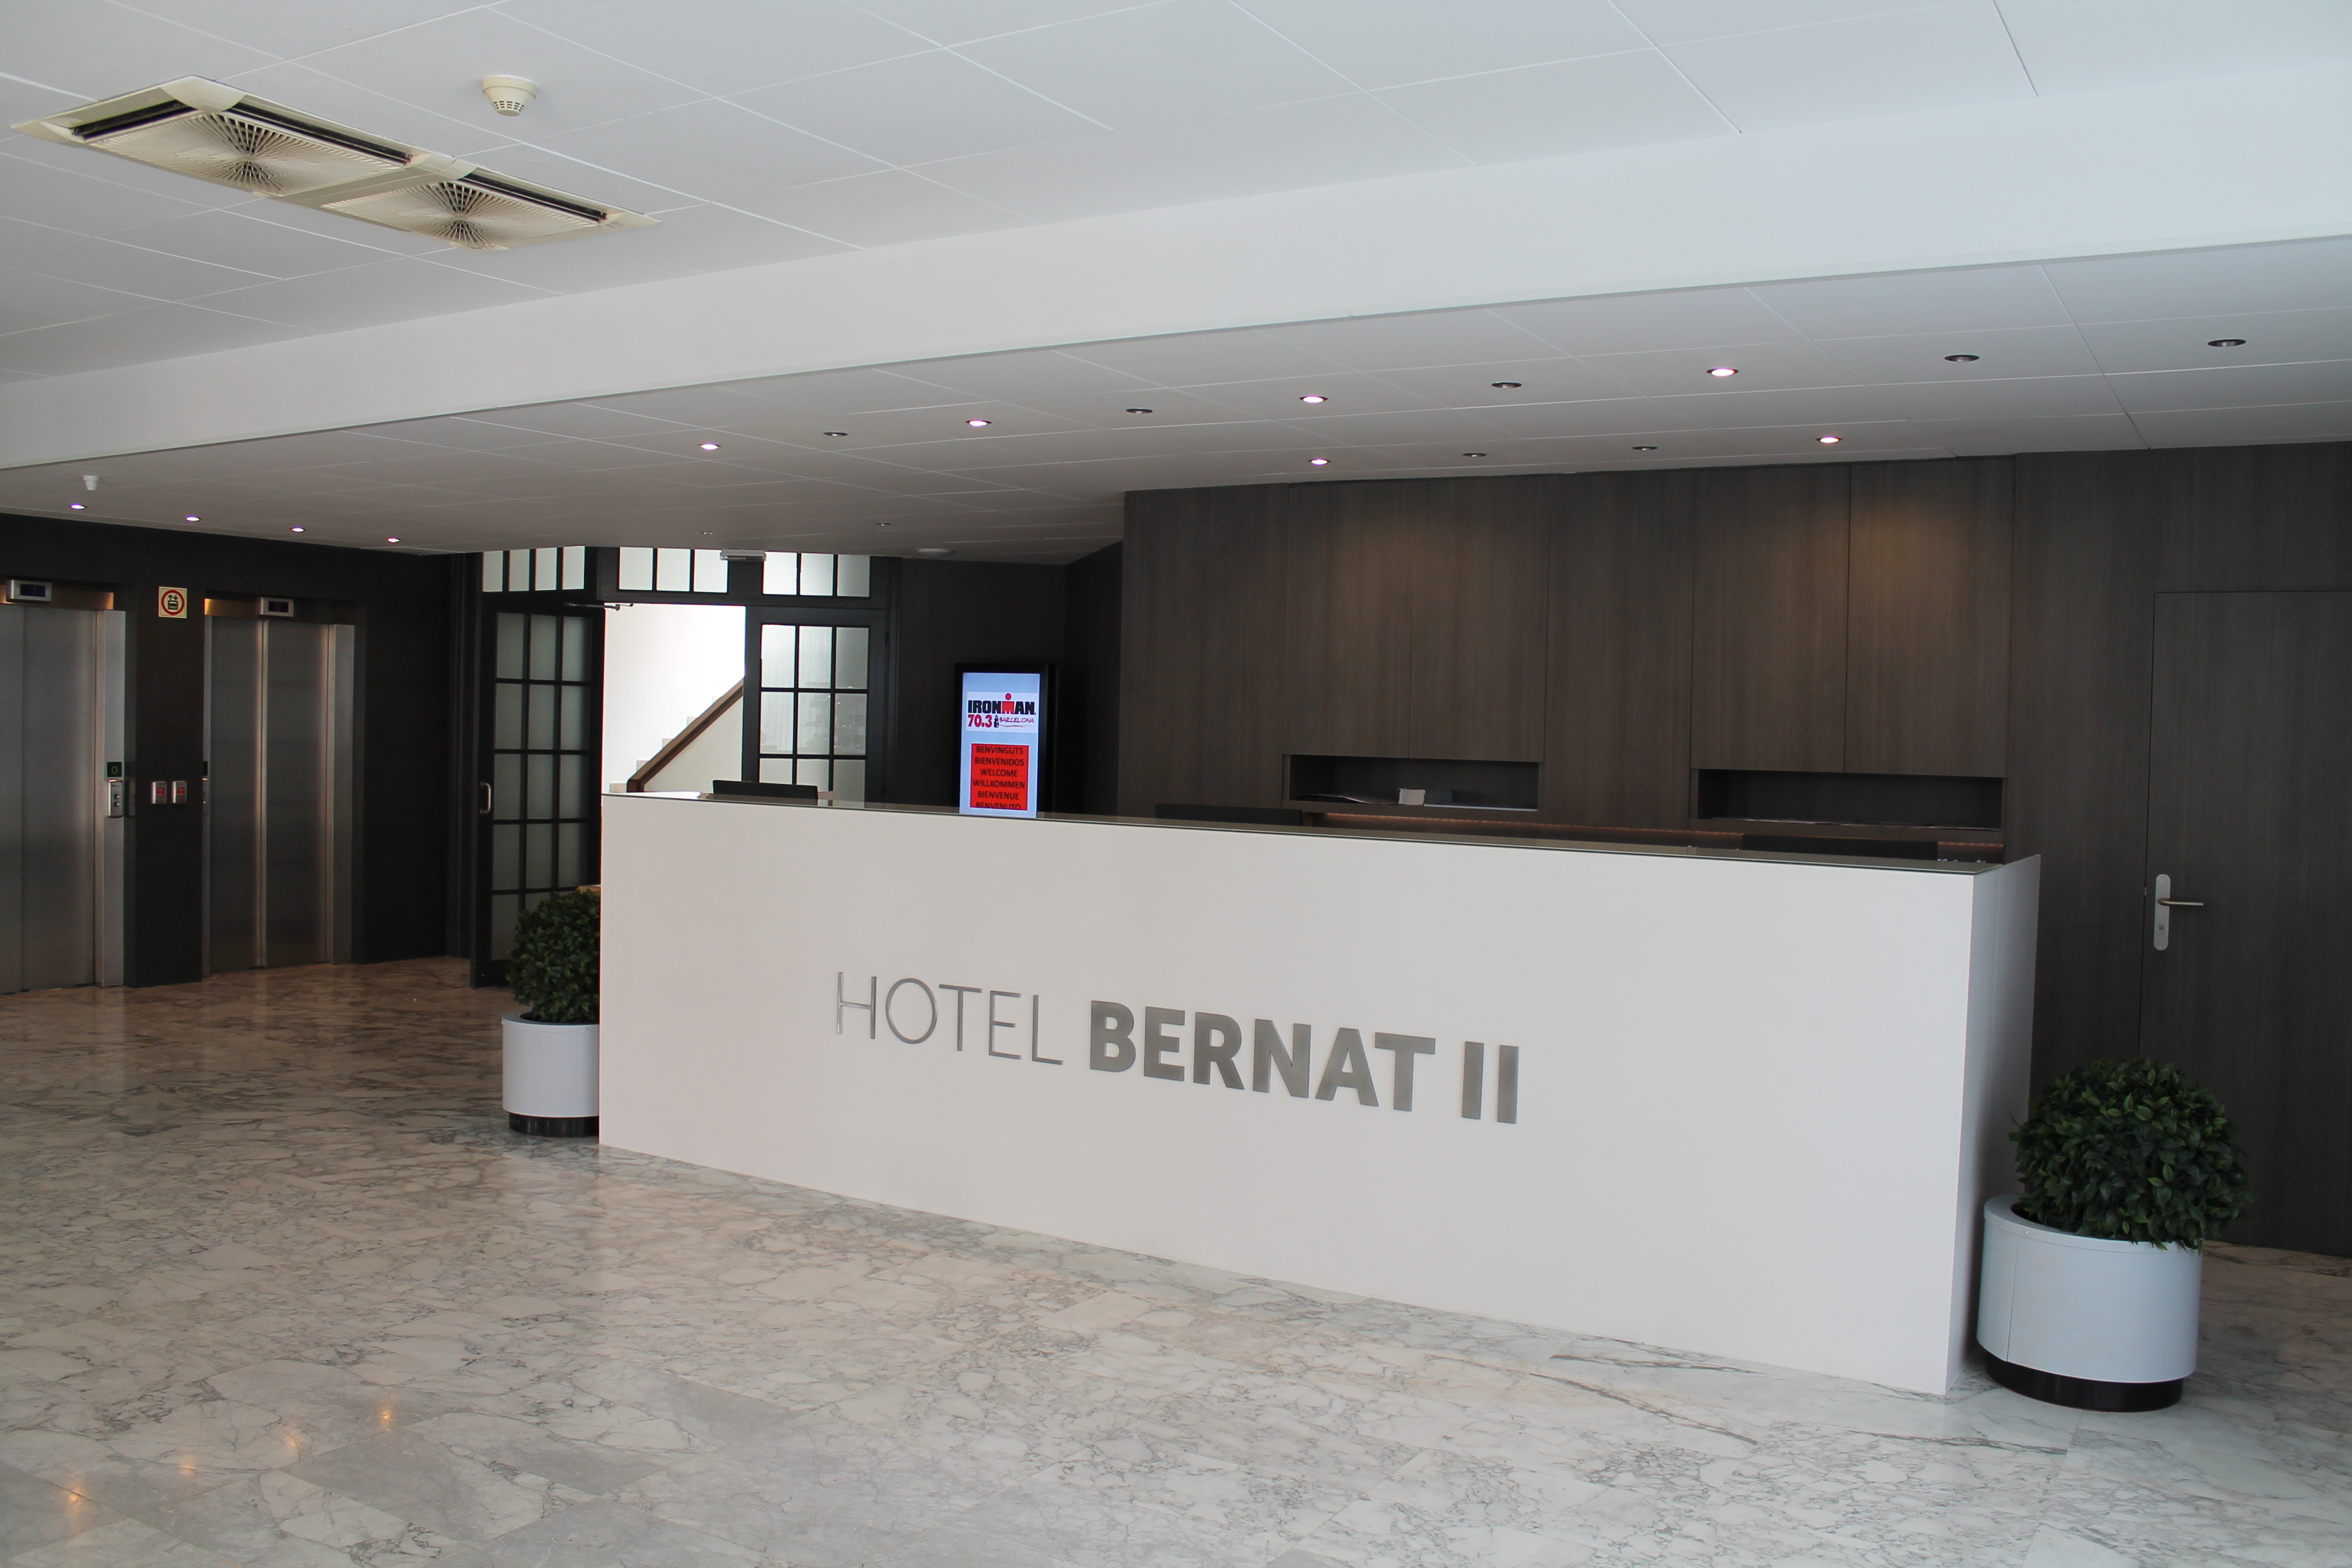 IMG_3444 HOTEL BERNAT